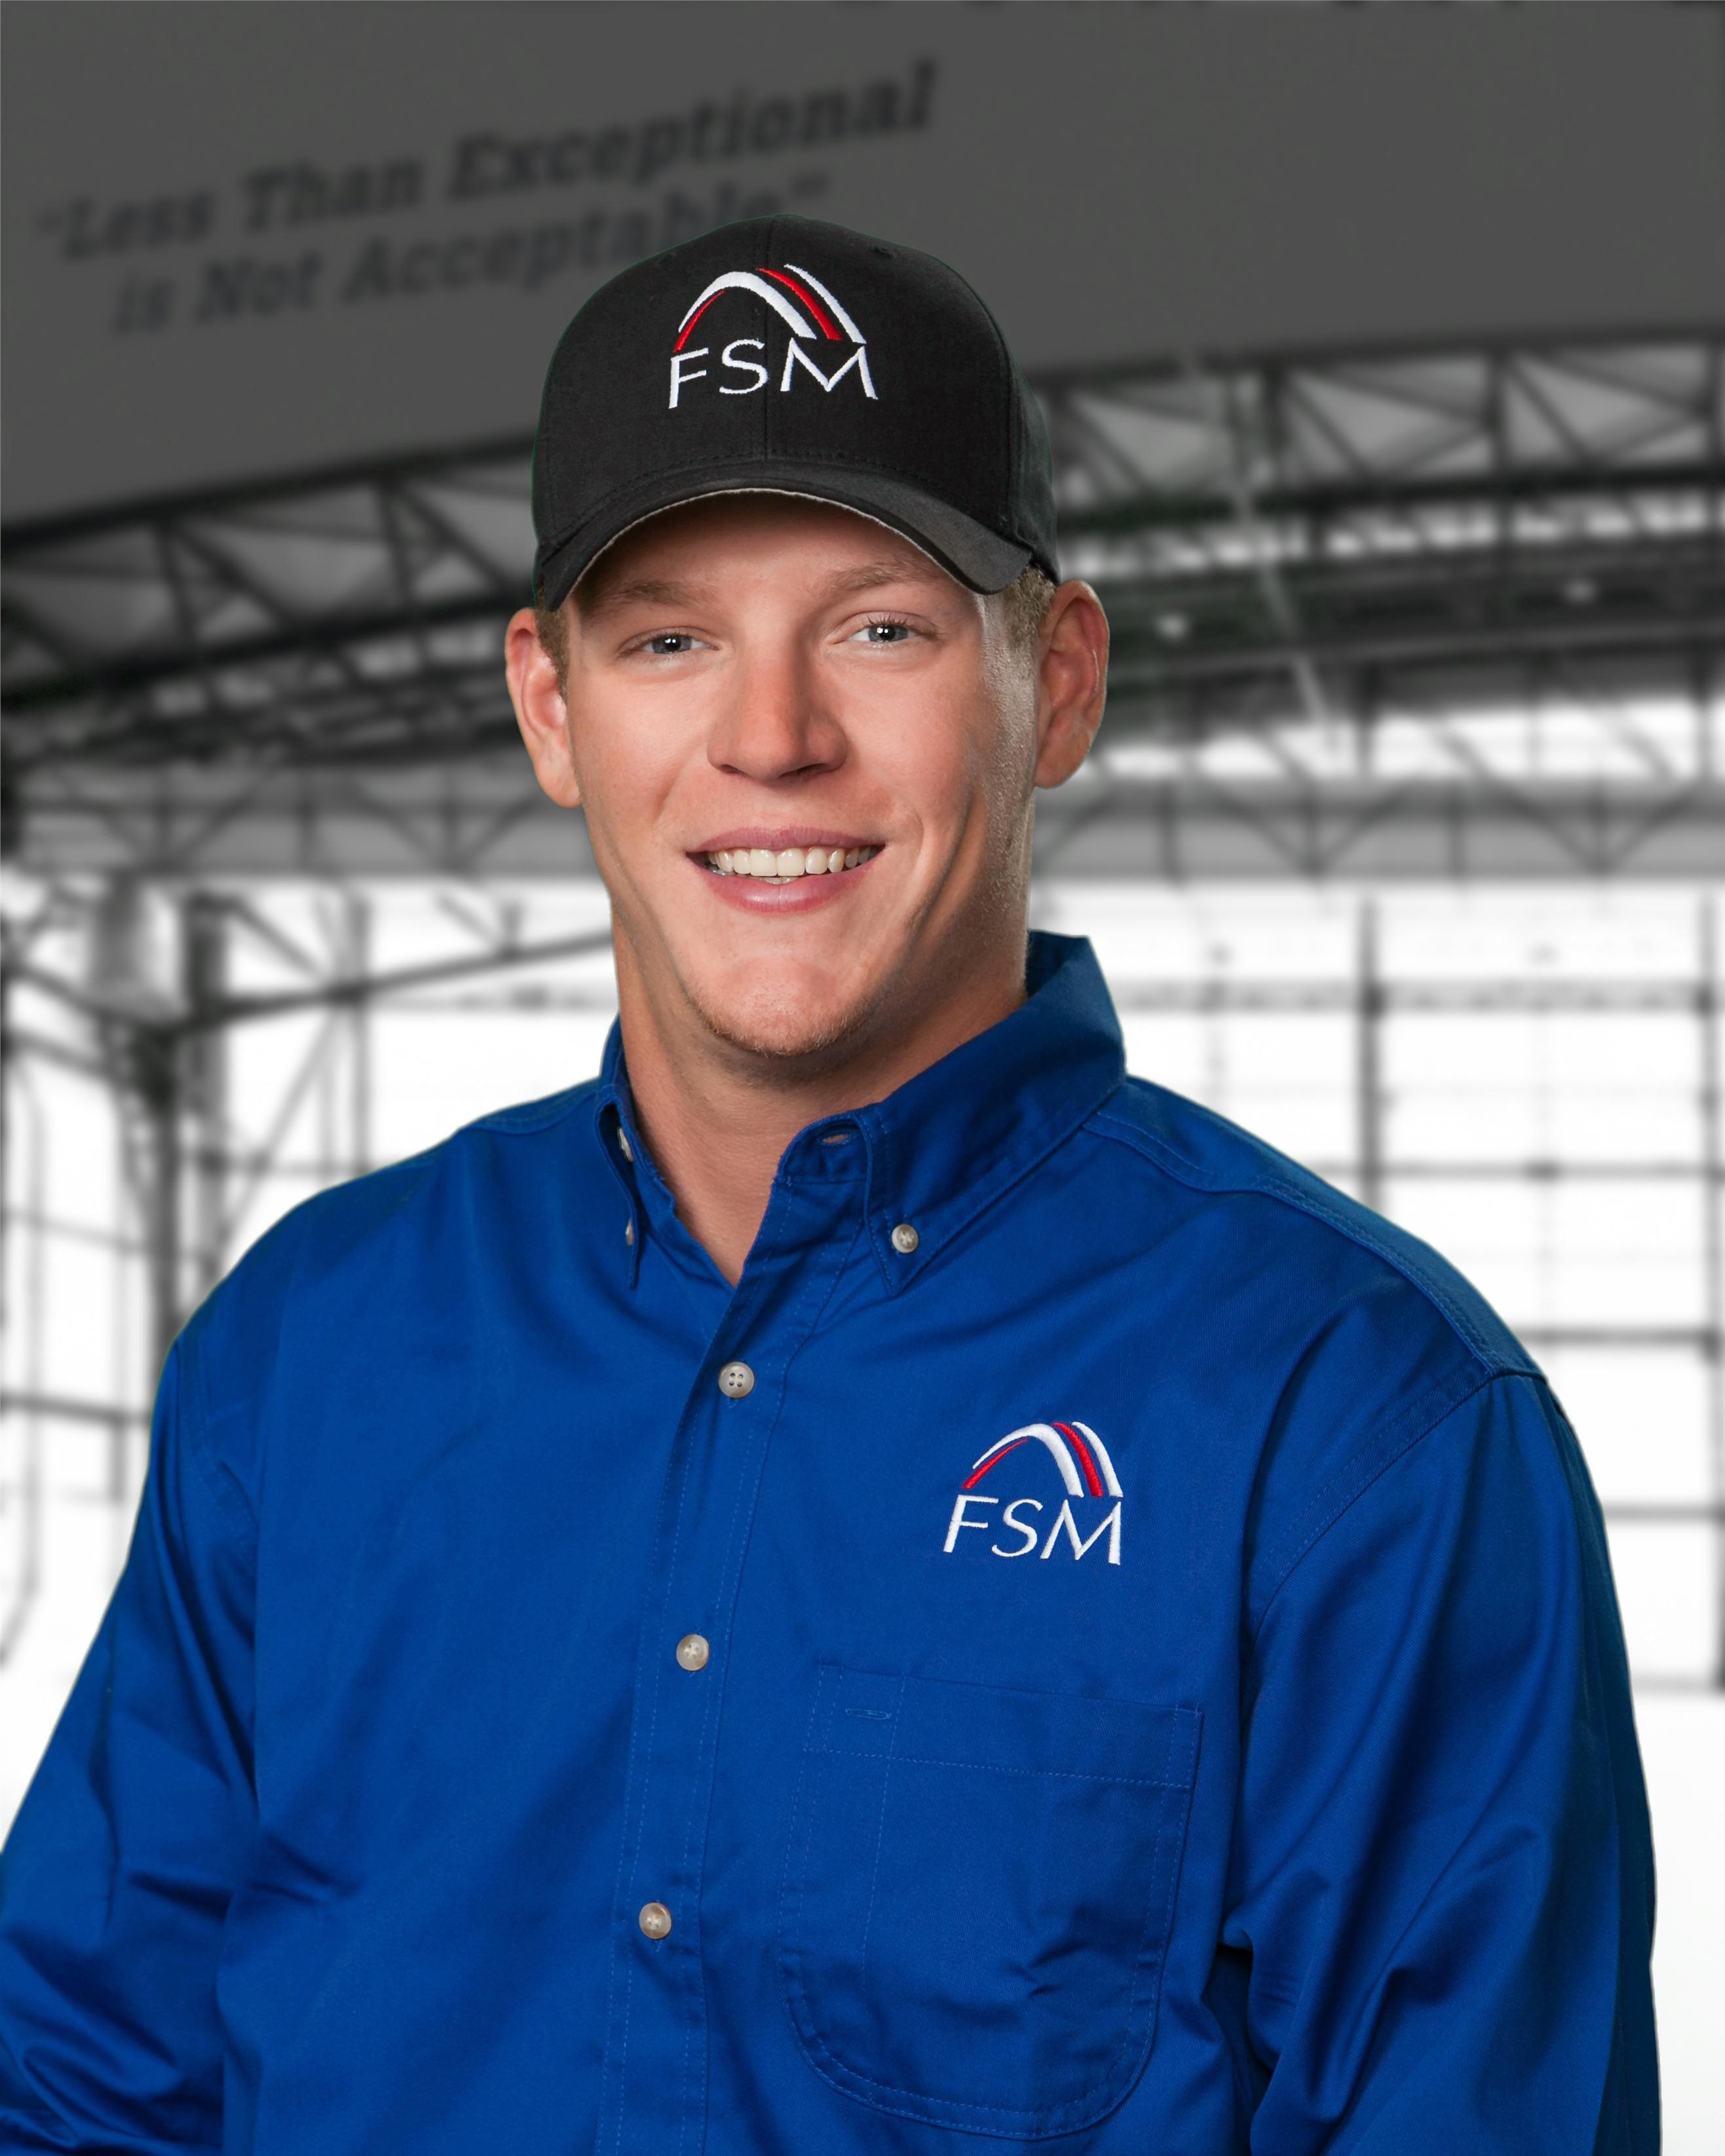 FSM Austin Genord Service Manager